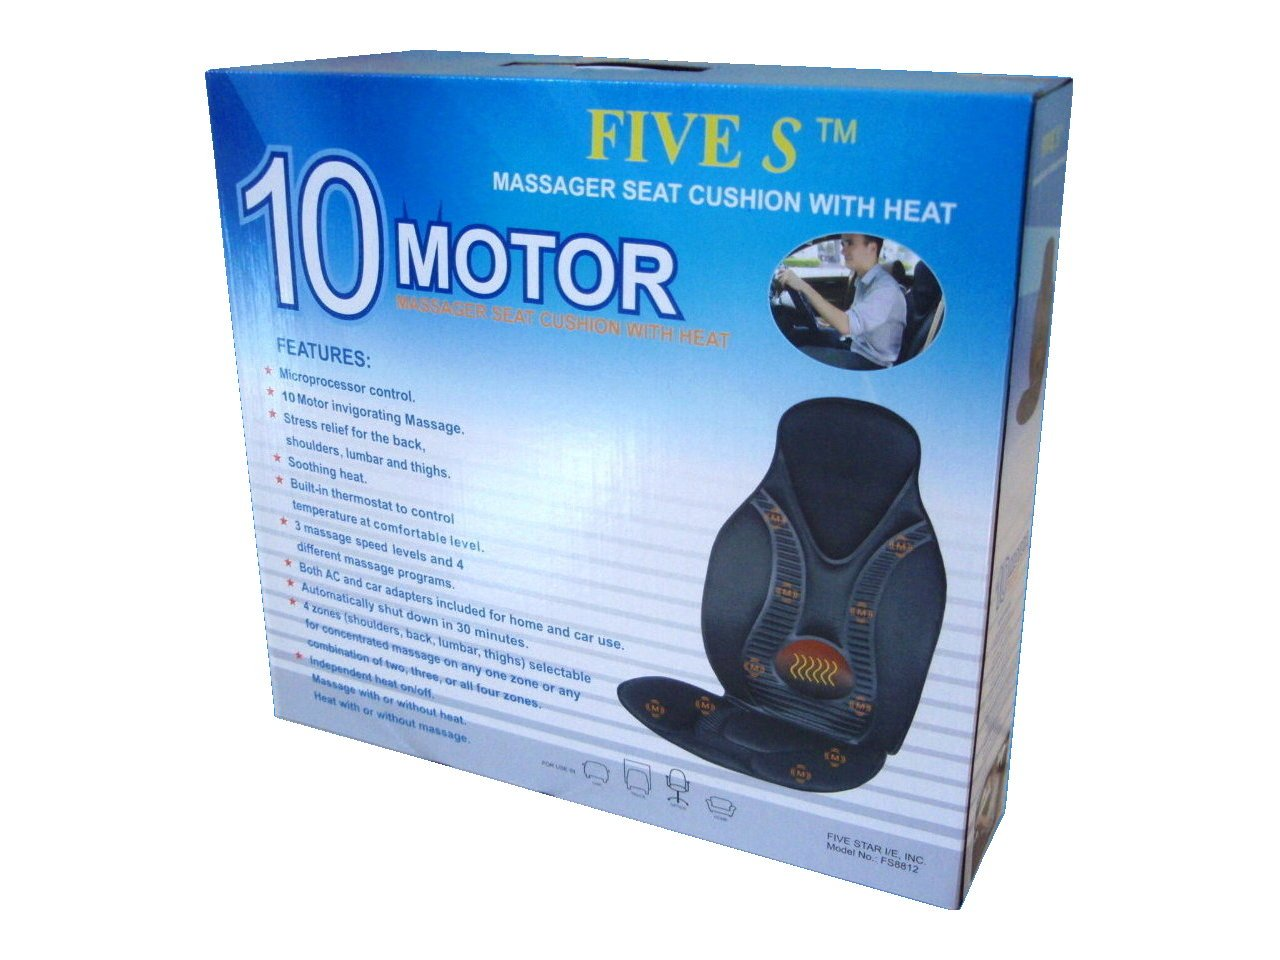 Amazoncom New Five Star FS8812 10 Motor Vibration Massage Seat